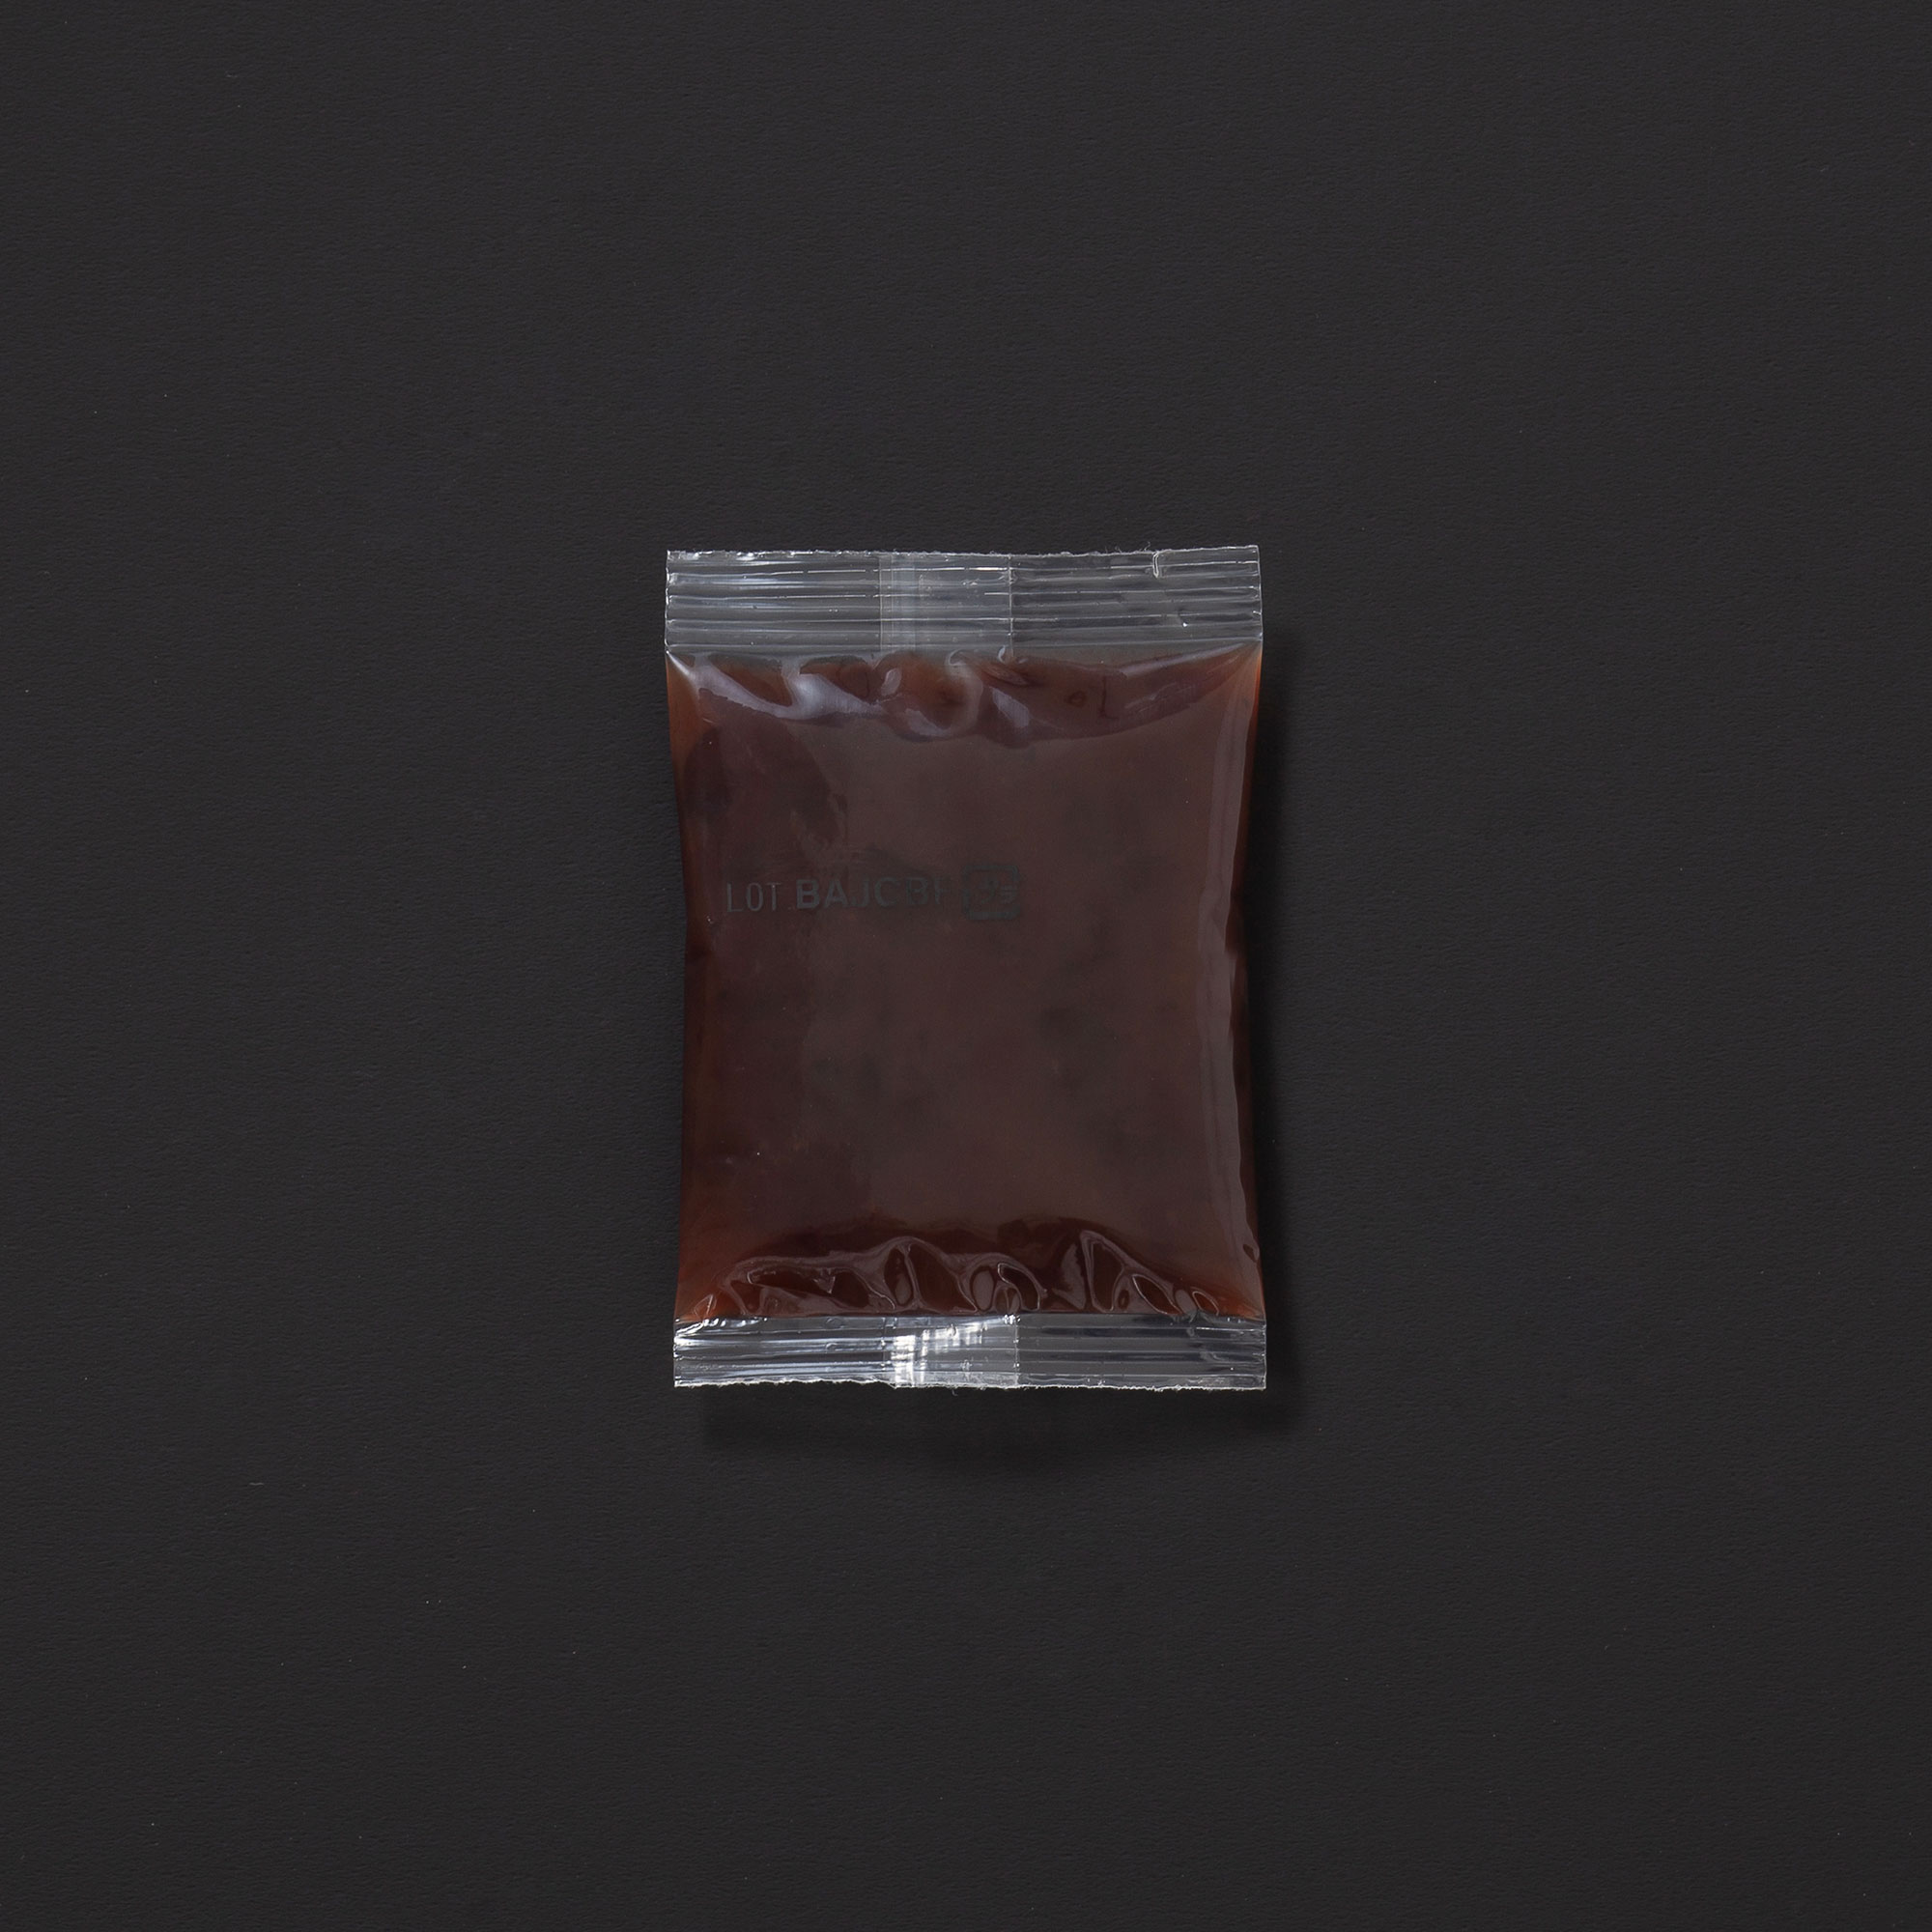 [J001] つぶあん (個包装)